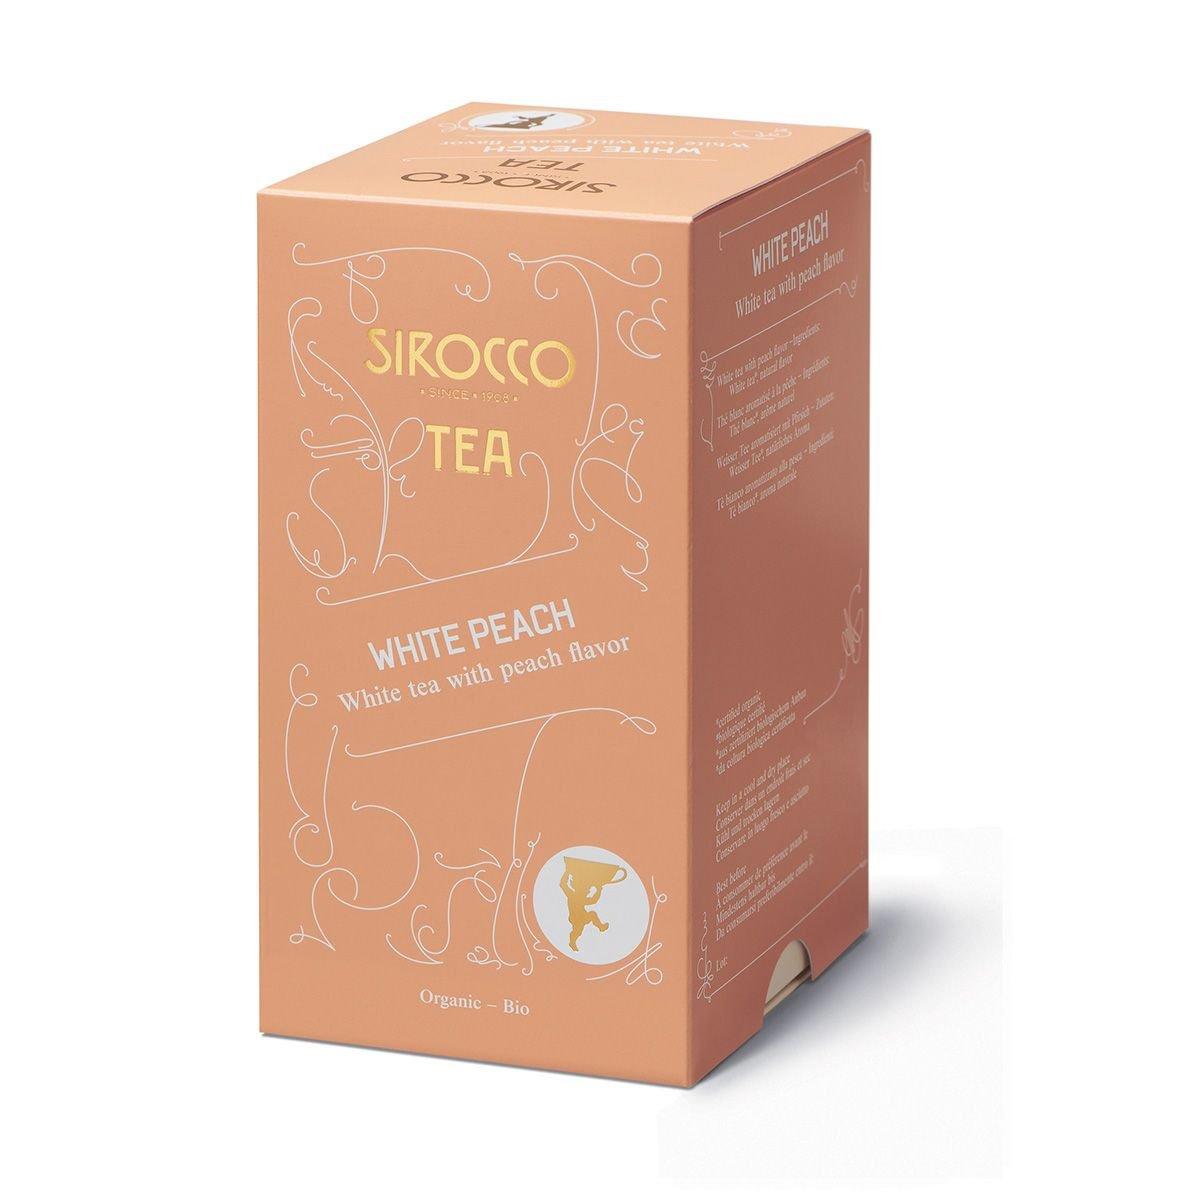 SIROCCO TEA Switzerland - WHITE PEACH - 3 x 20 tea bags (60 count)